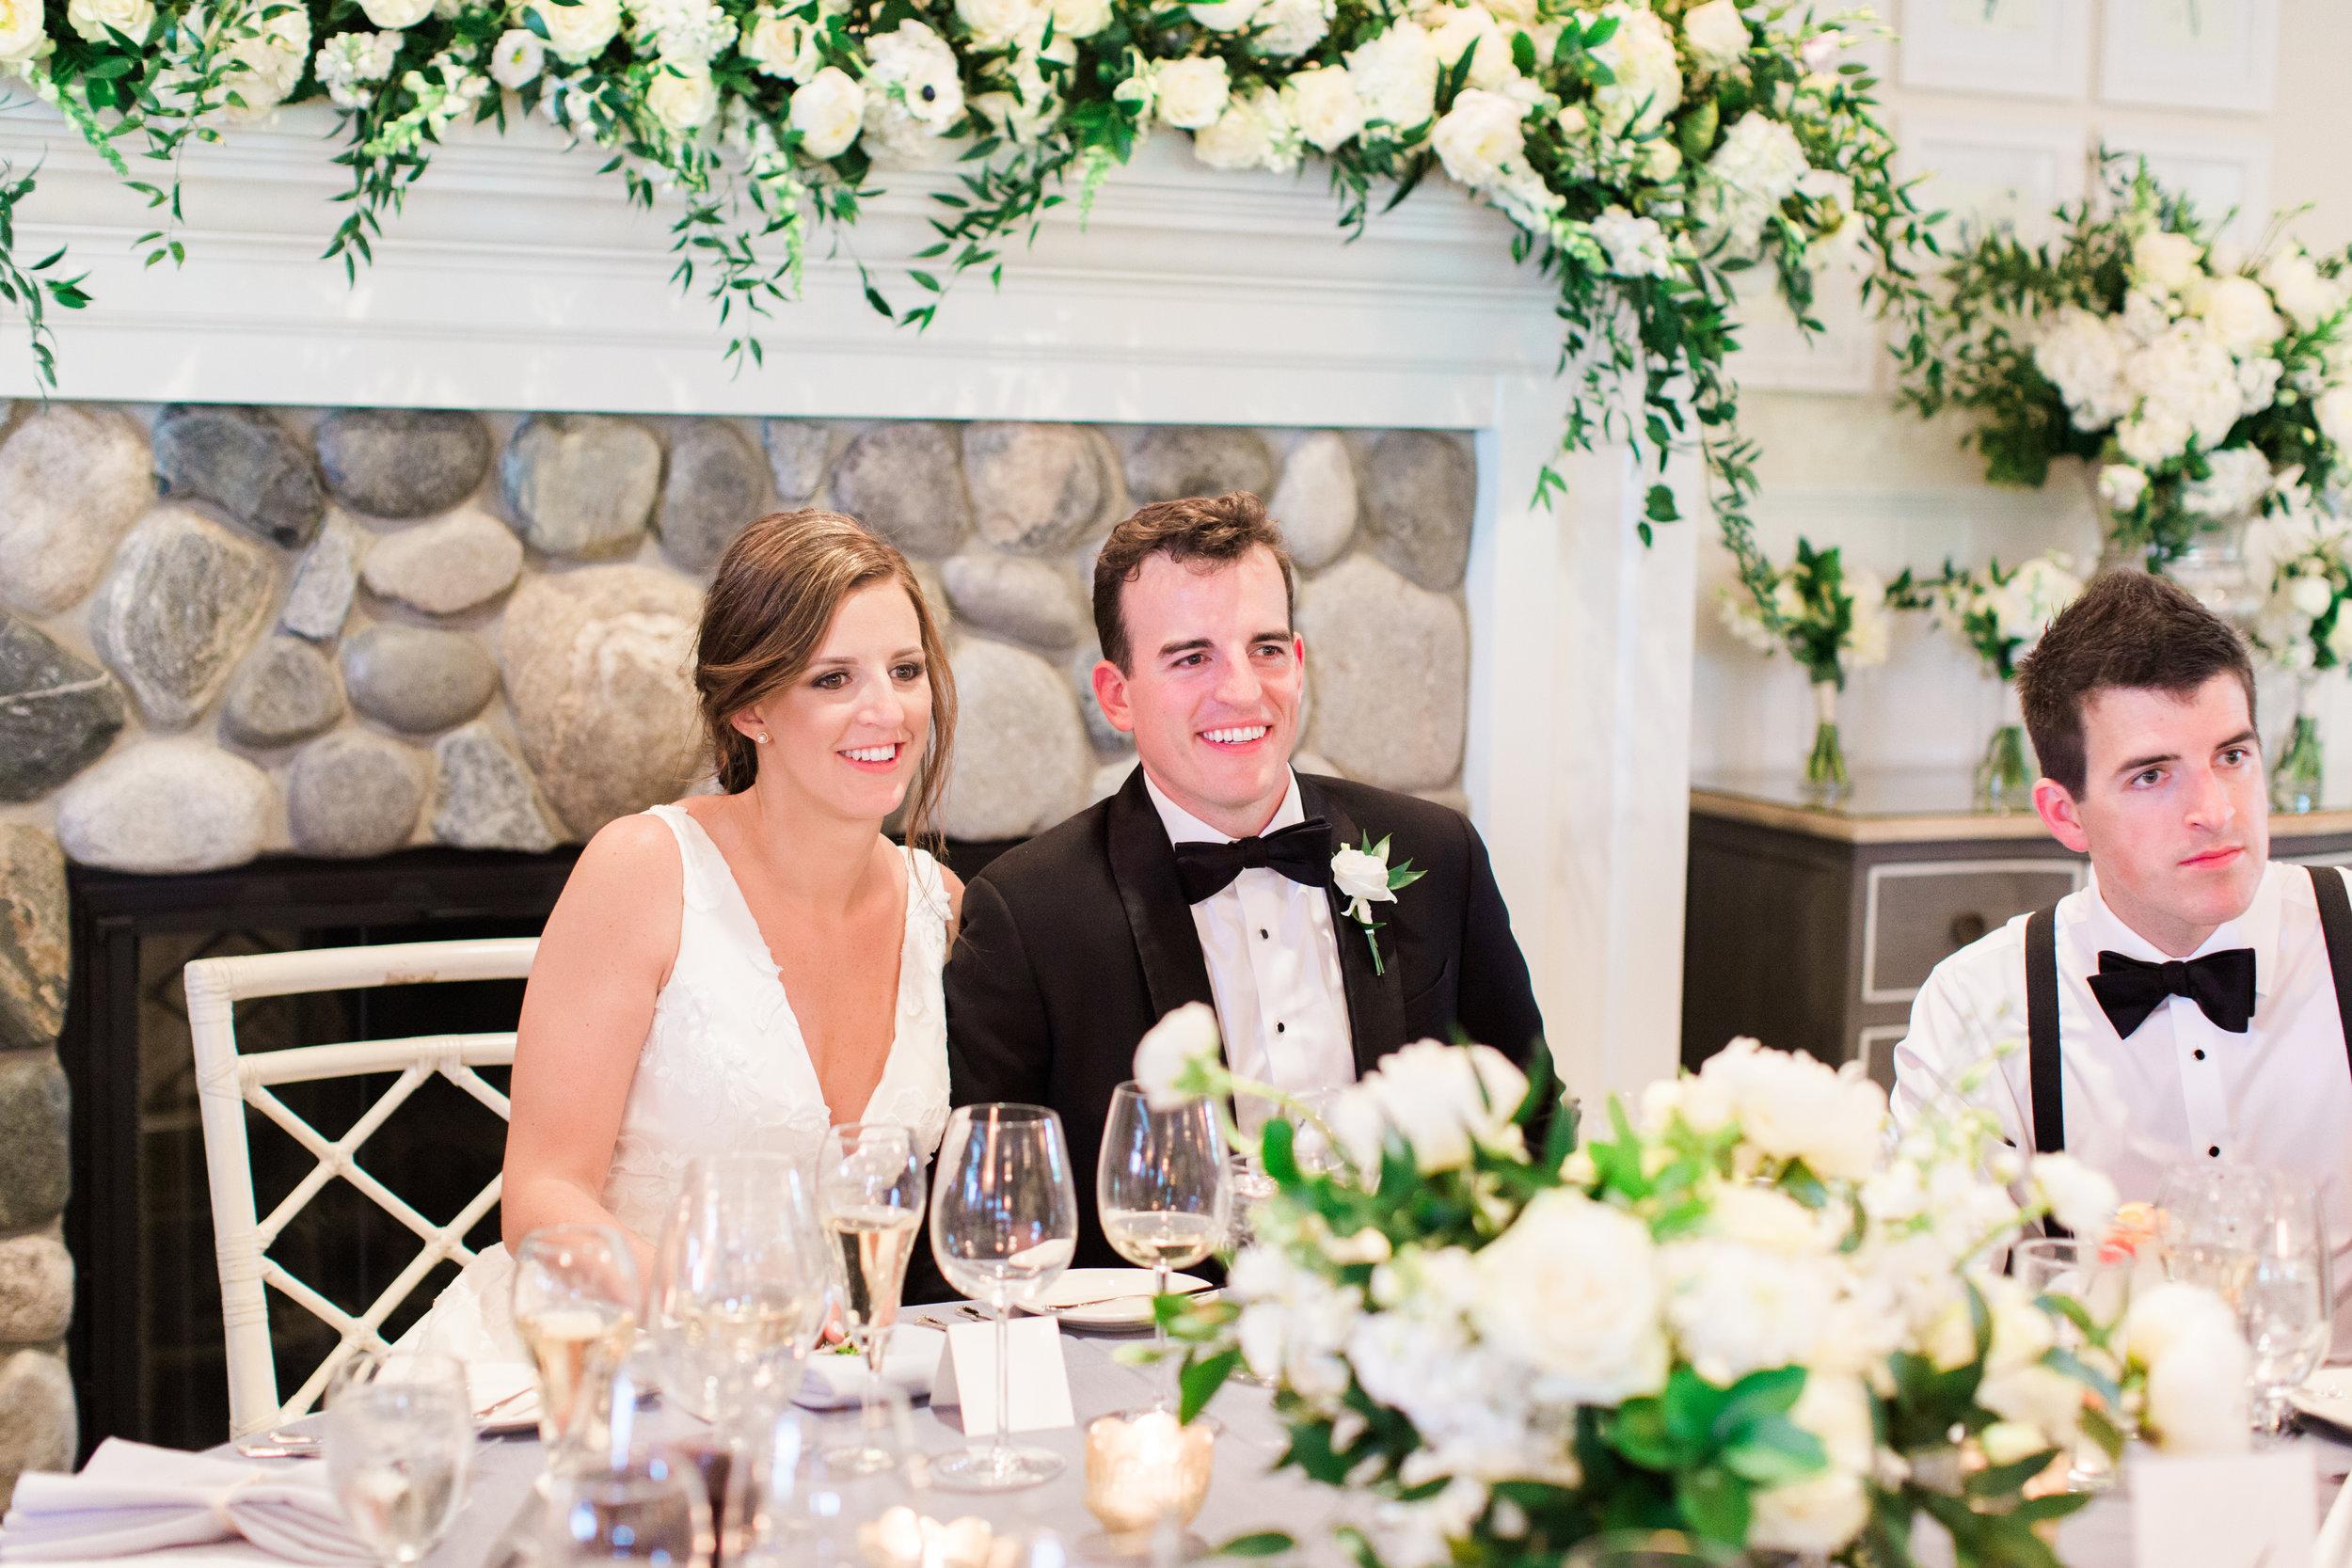 DeGuilio+Wedding+Reception-32.jpg